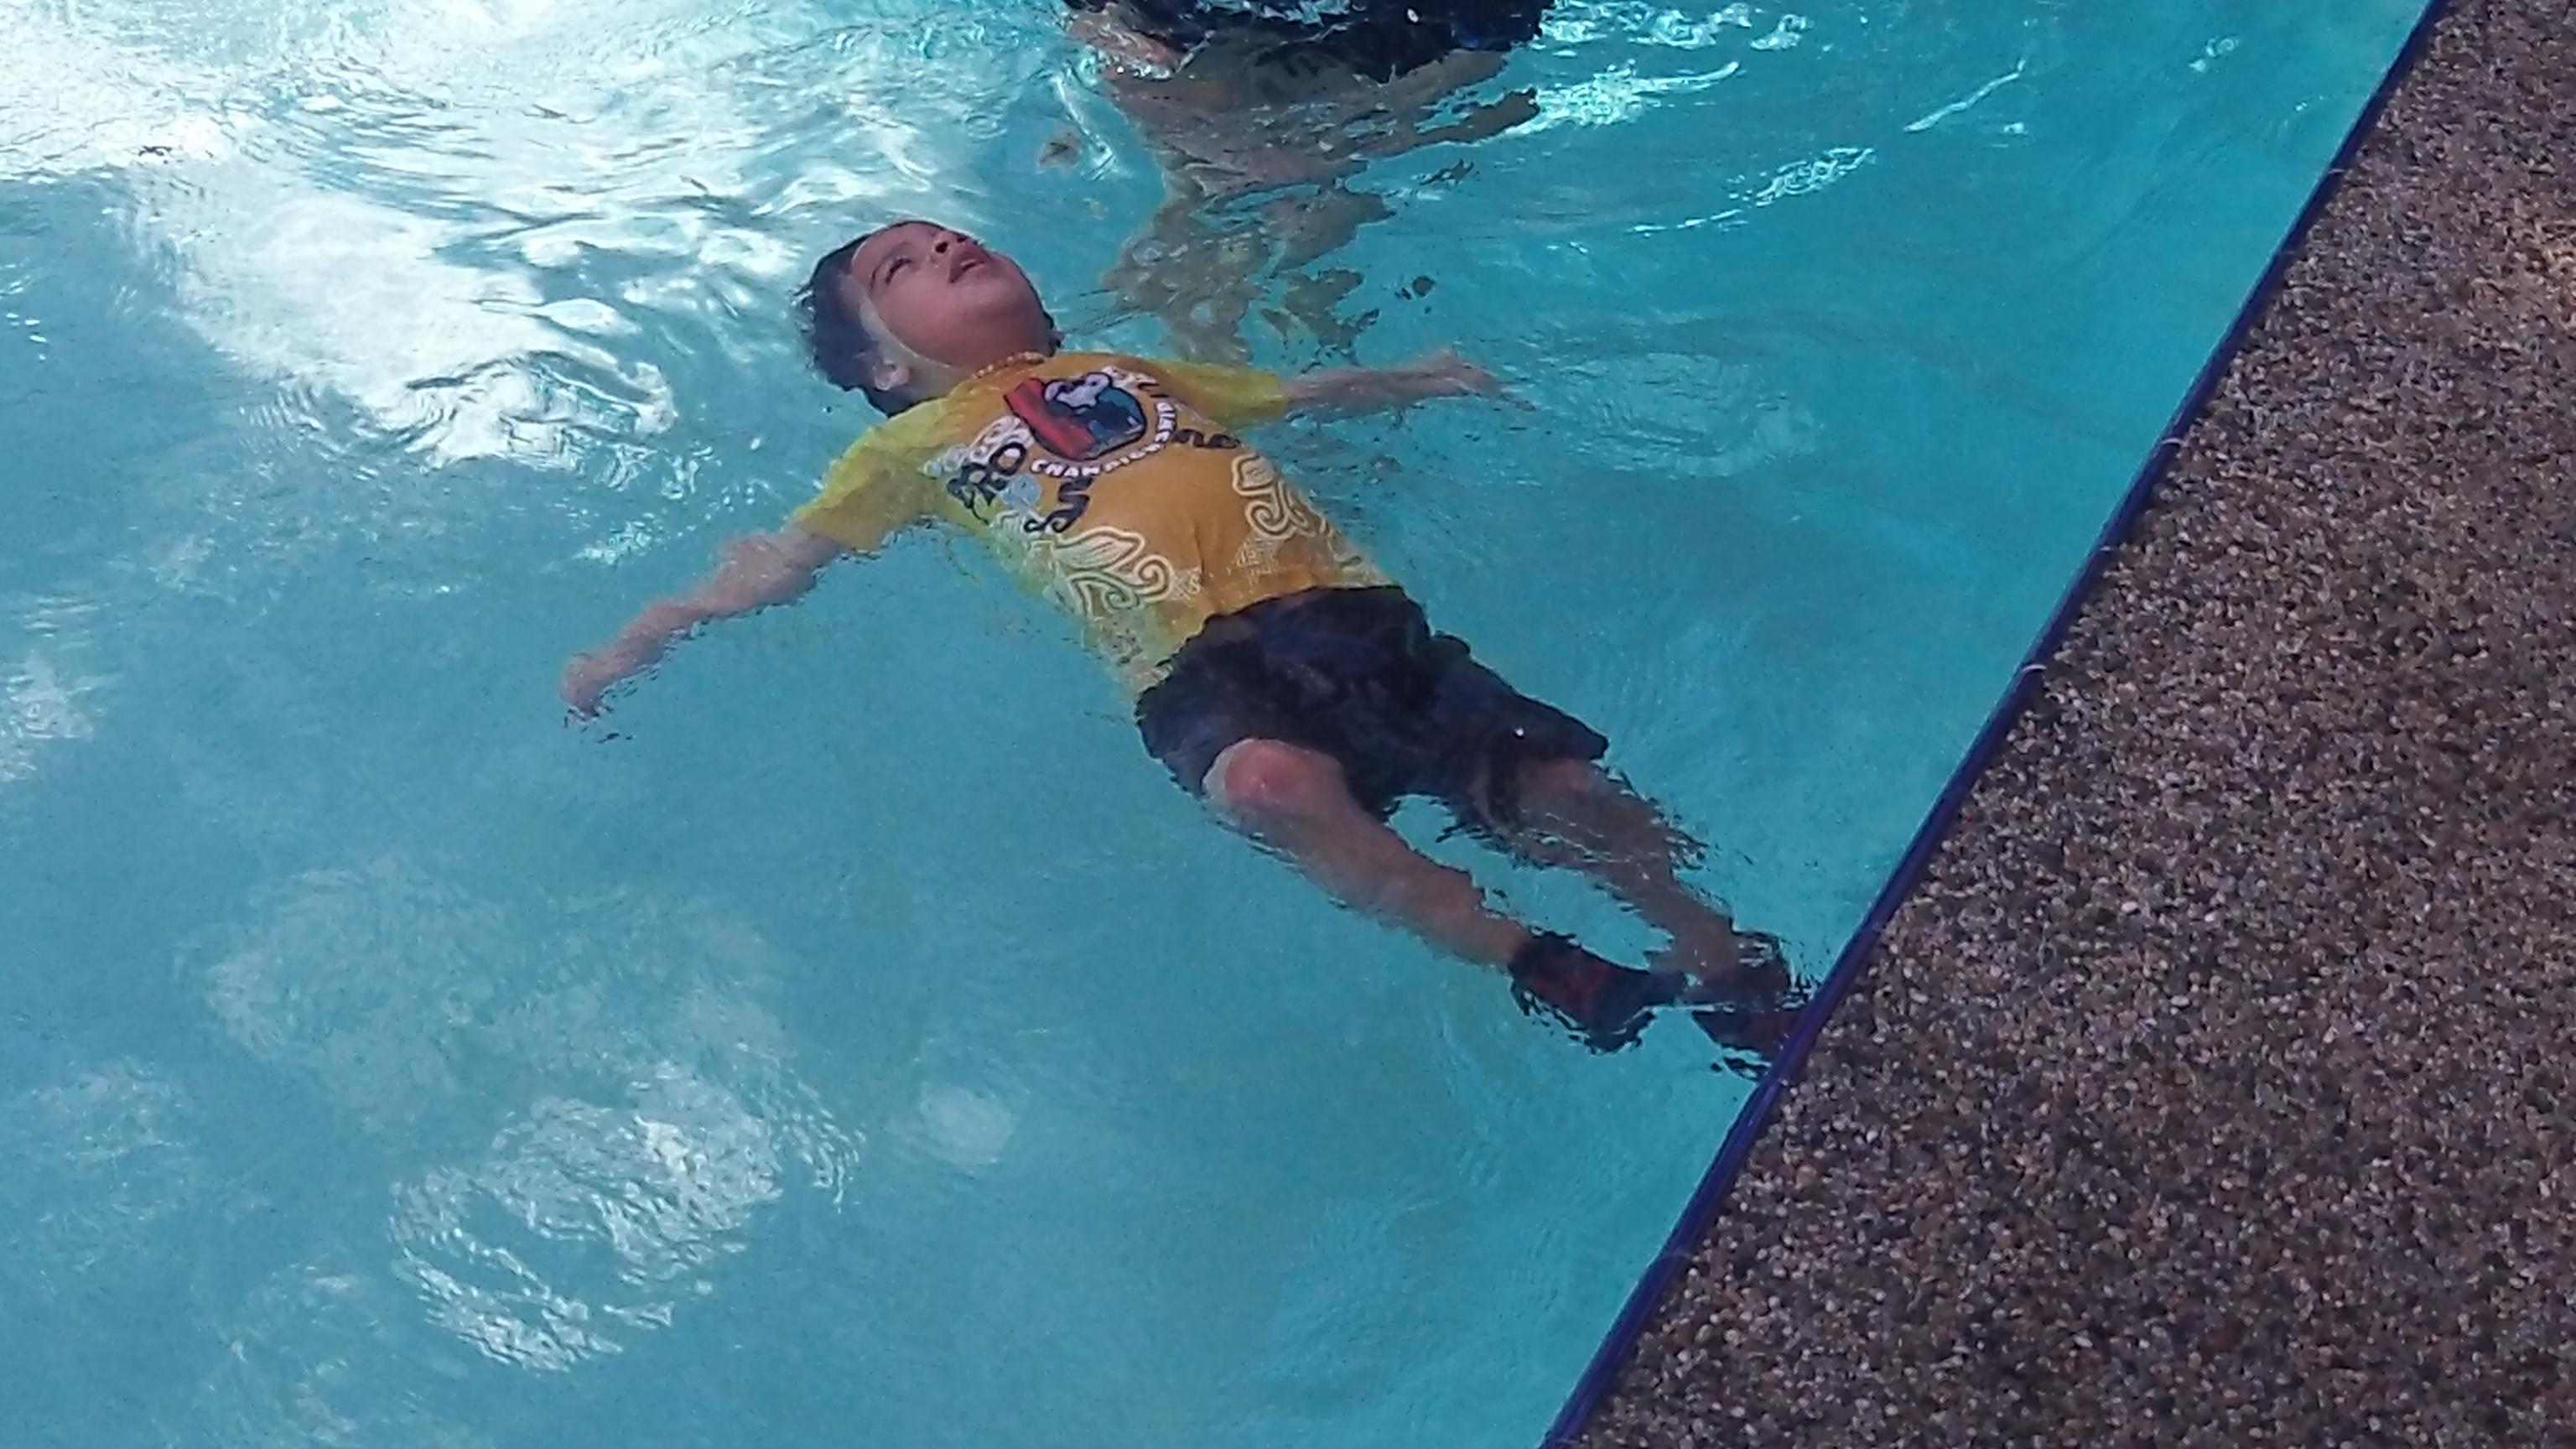 Landon float